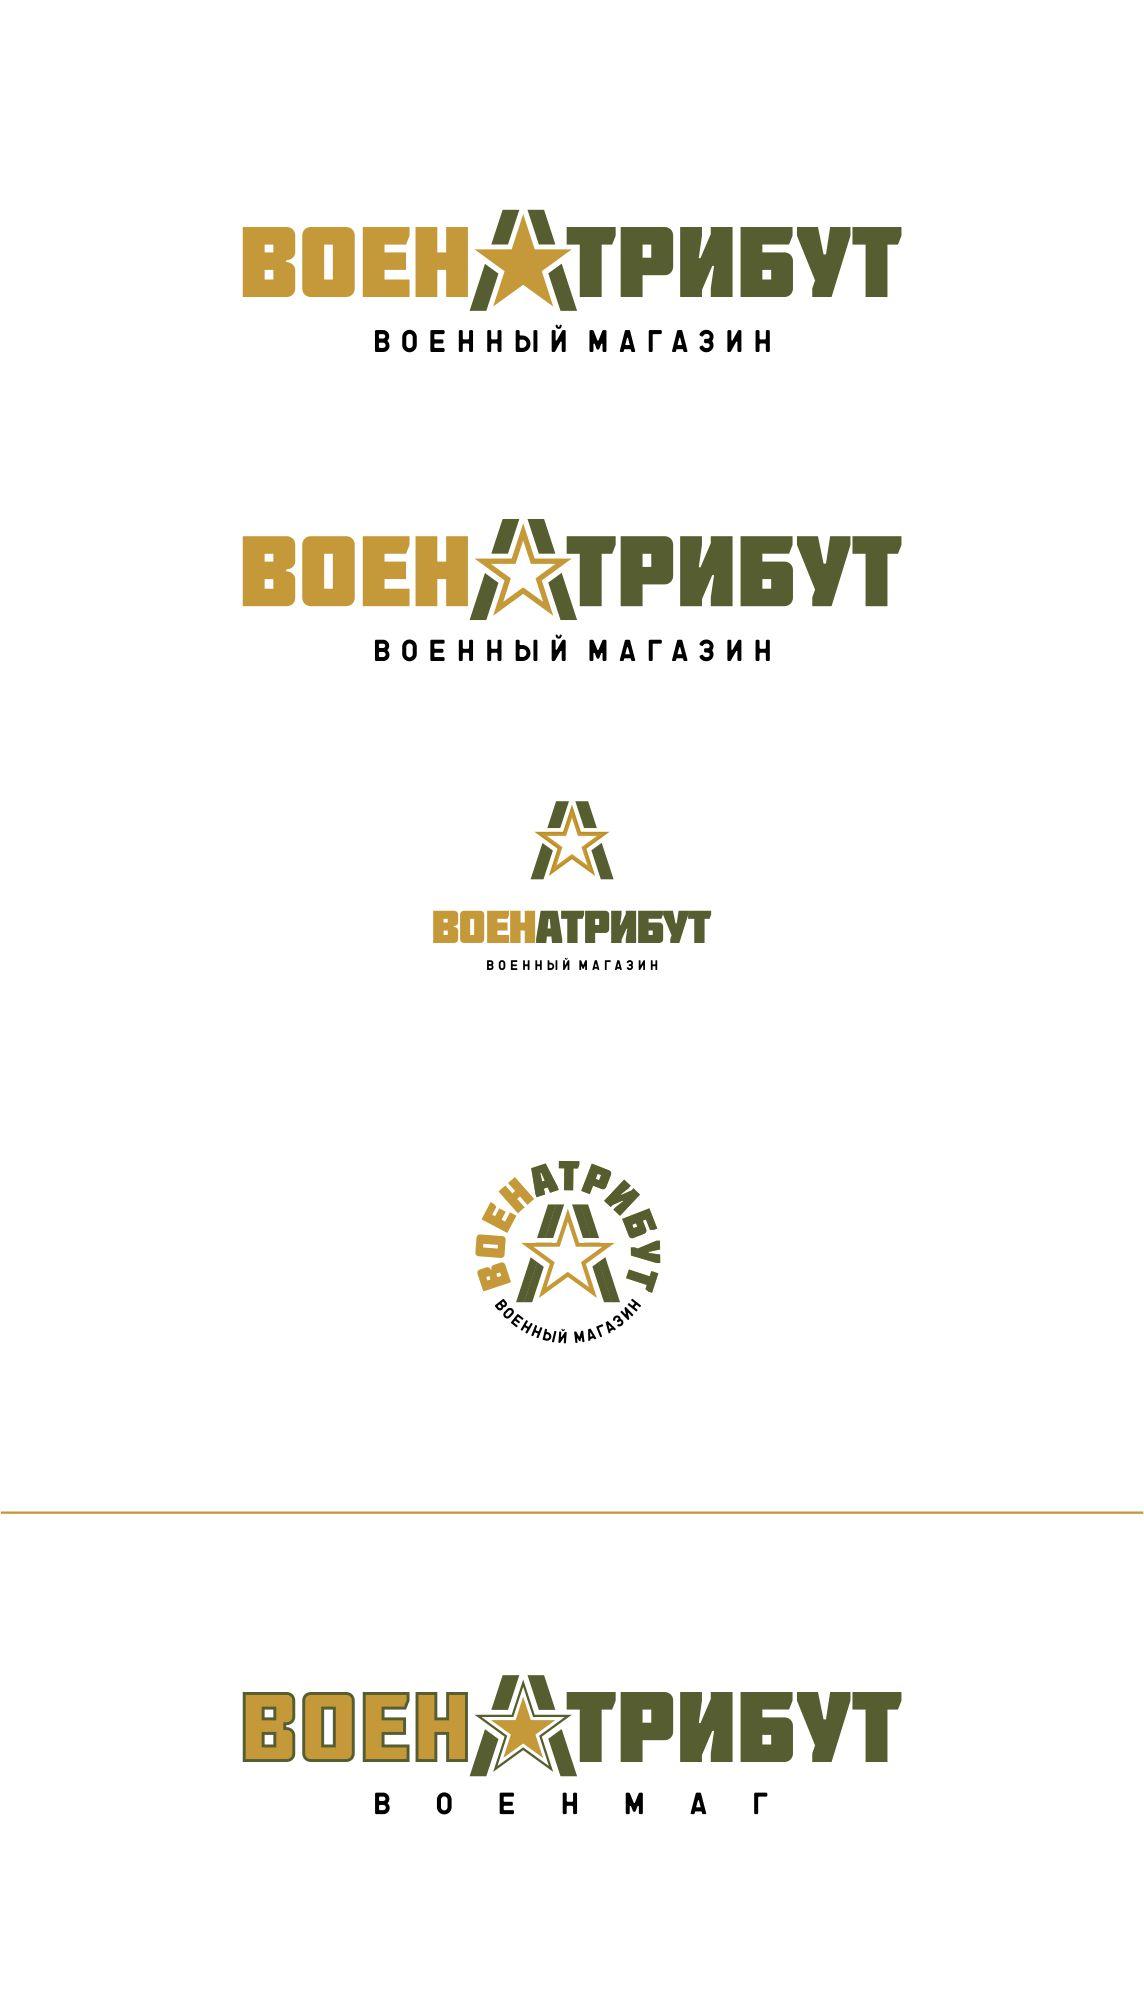 Разработка логотипа для компании военной тематики фото f_269601f17502c3b3.jpg